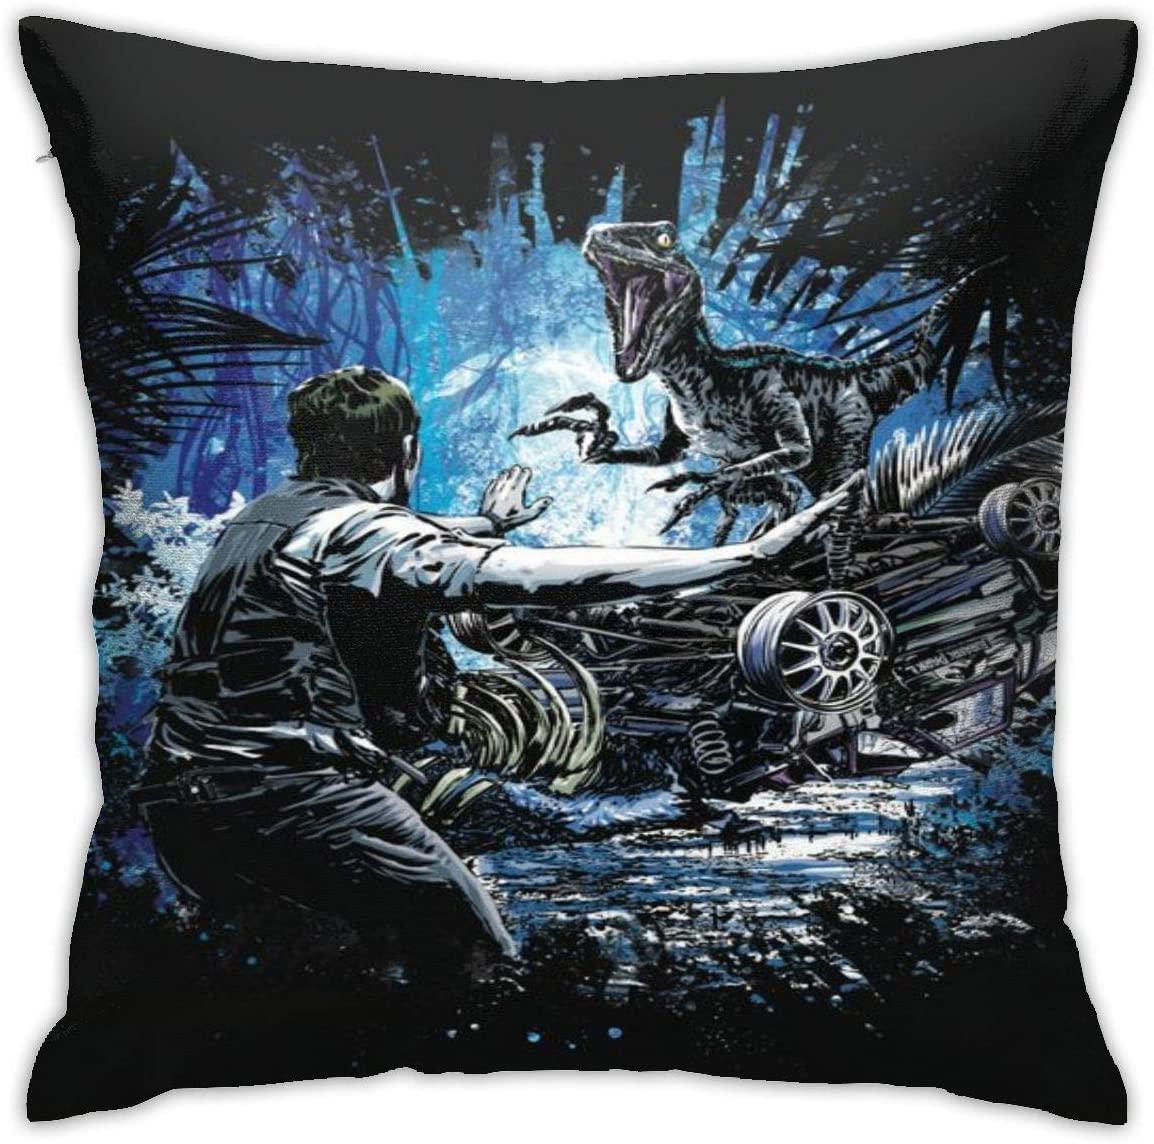 Dinosaur Velvet Throw Pillow Cover Decor Unique Pillows Case Square Cushion for Sofa Couch Home Decoration 18